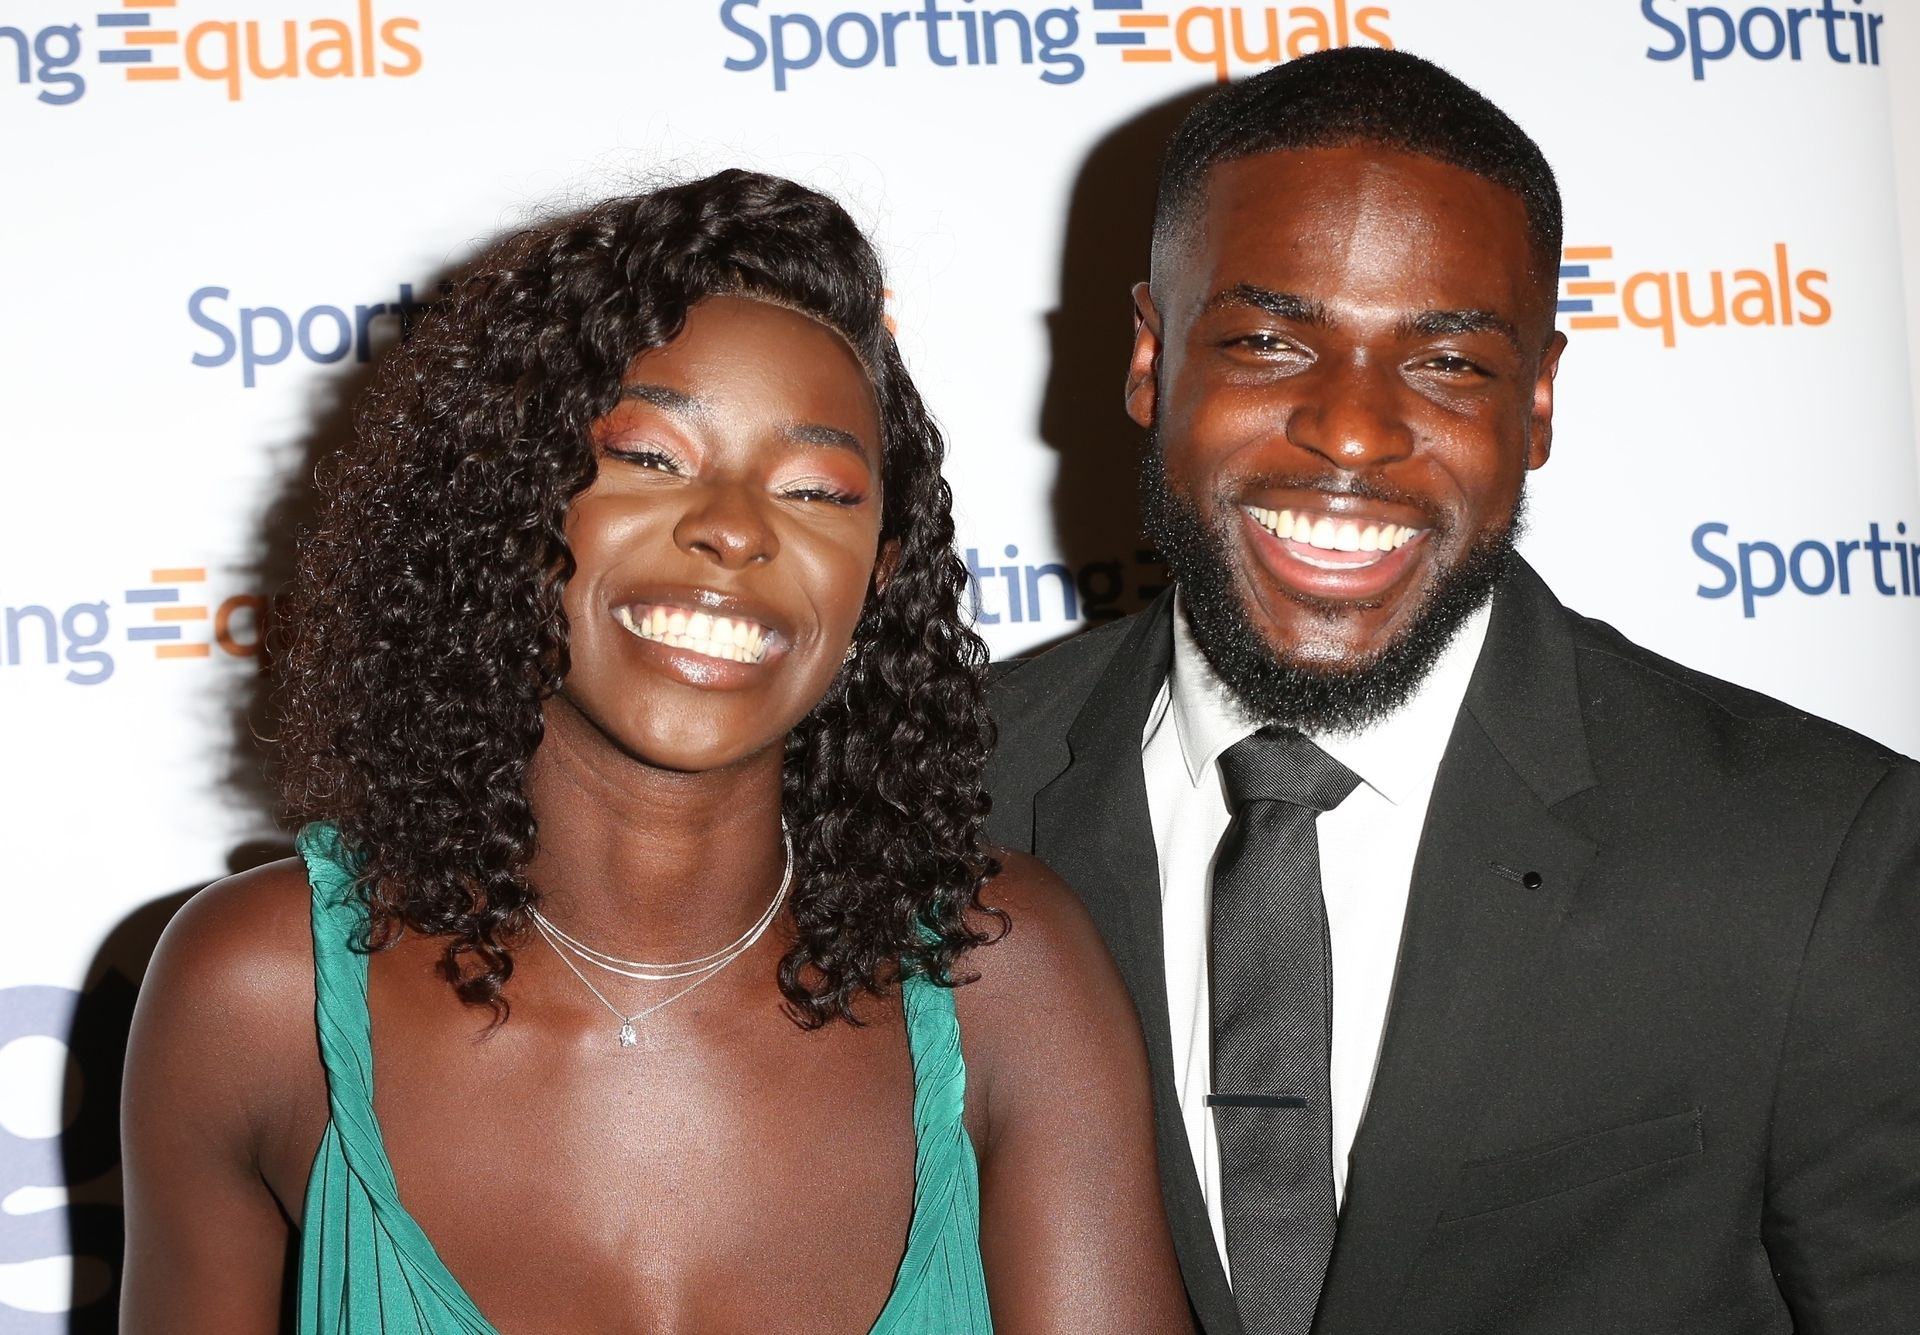 Mike Boateng & Priscilla Anyabu Are Seen At British Ethnic Diversity Sports Awards 0111